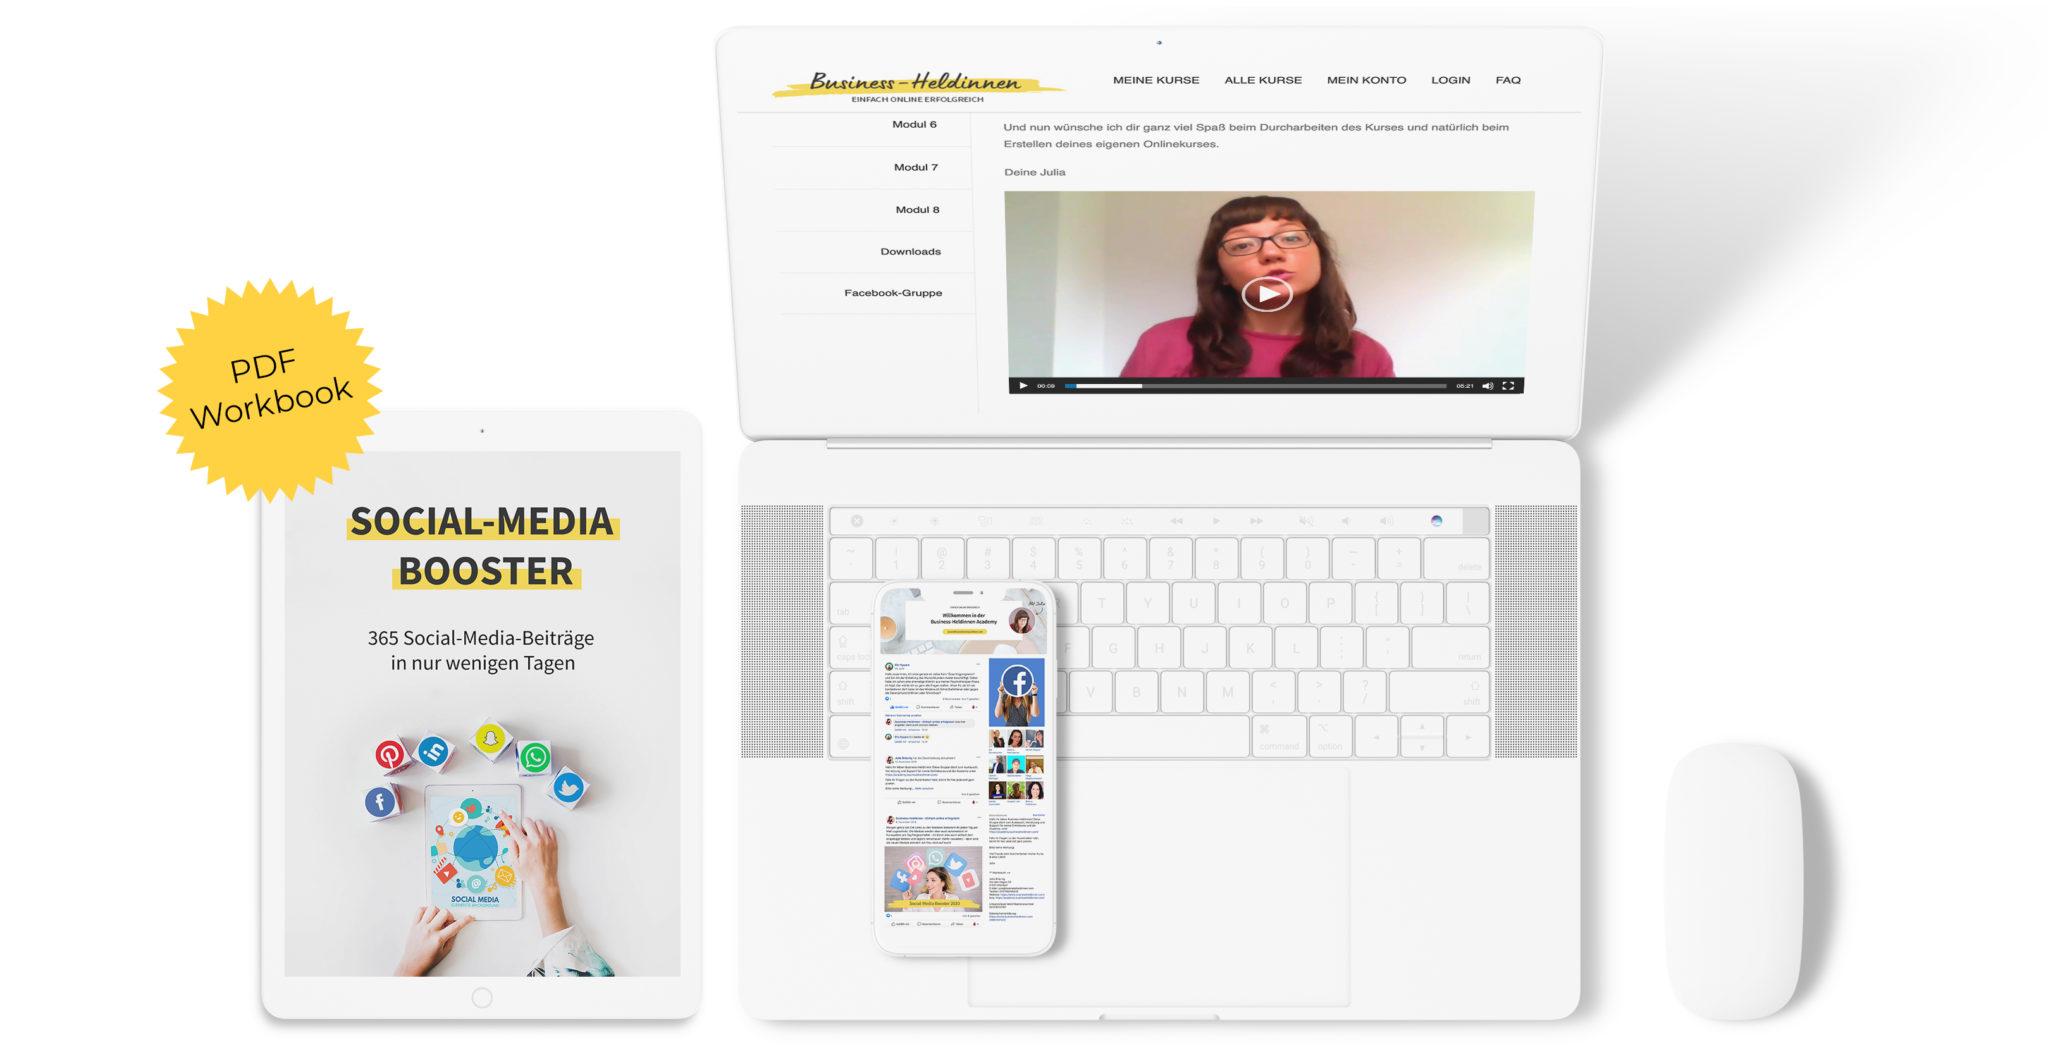 Social-Media Booster - Deine Social-Media-Beiträge fürs ganze Jahr